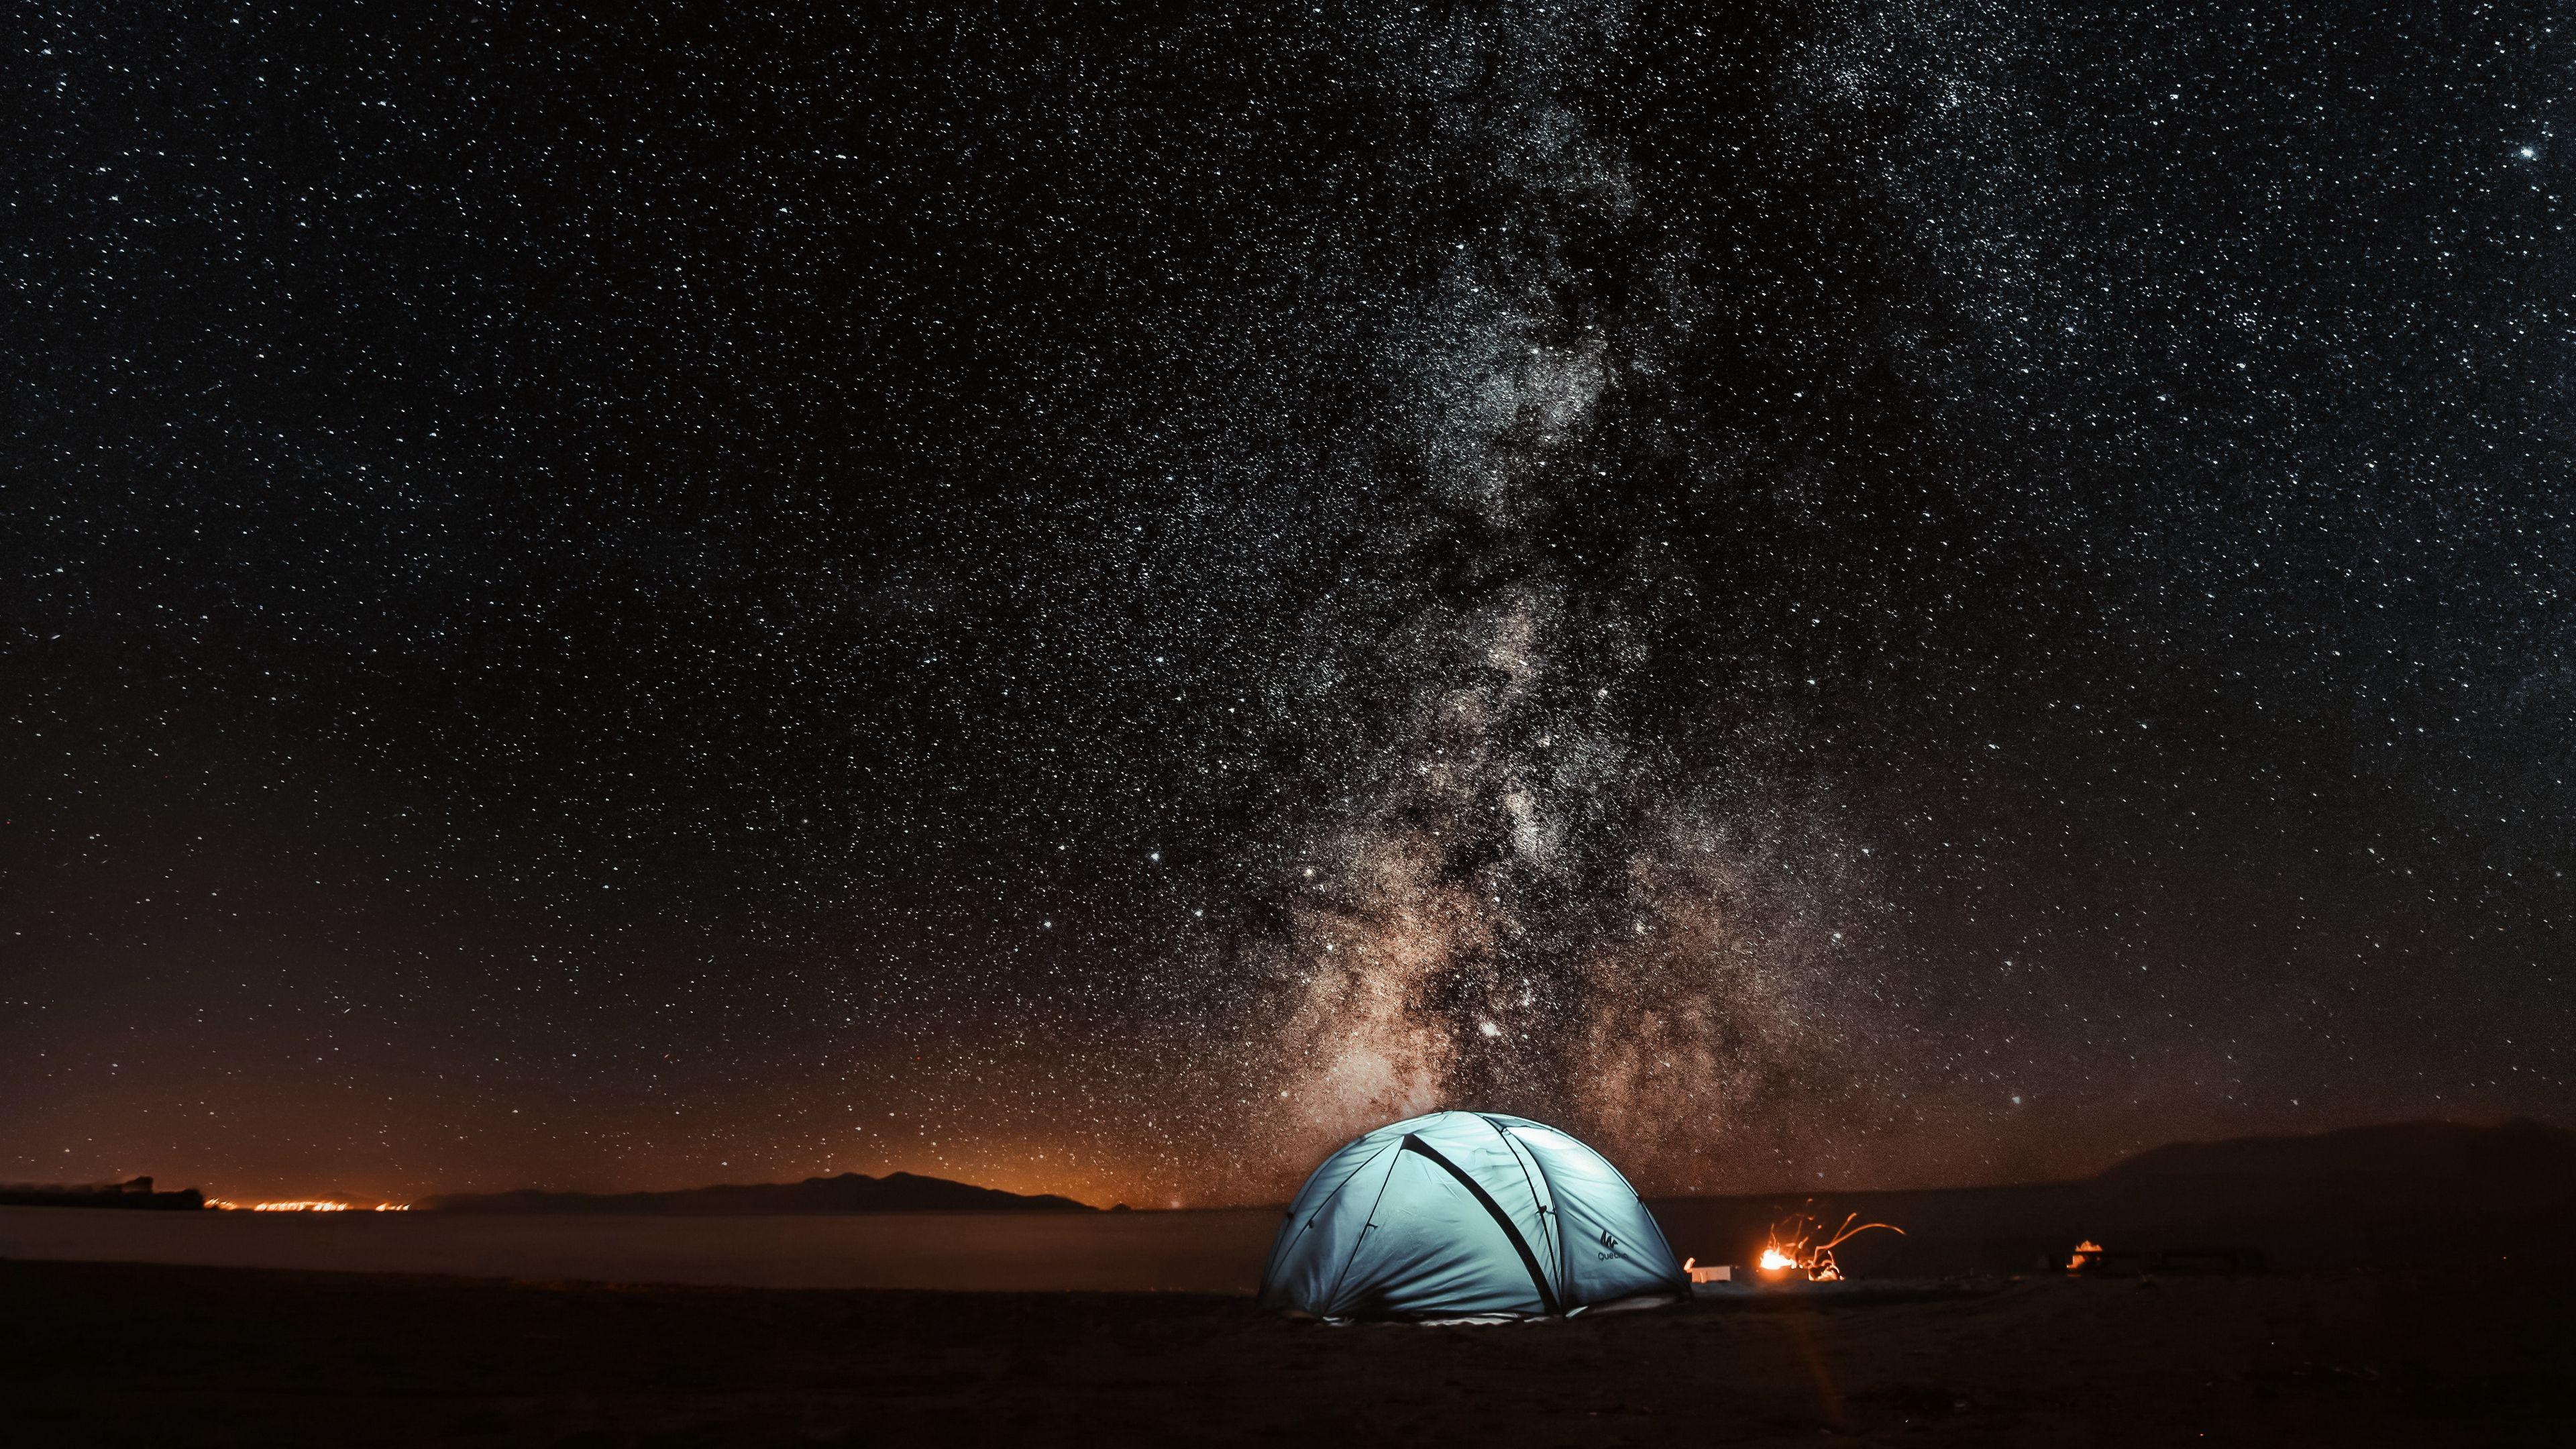 Tent Starry Sky 4k Wallpaper Sky Wallpaper Night Sky Wallpaper Uhd Wallpaper